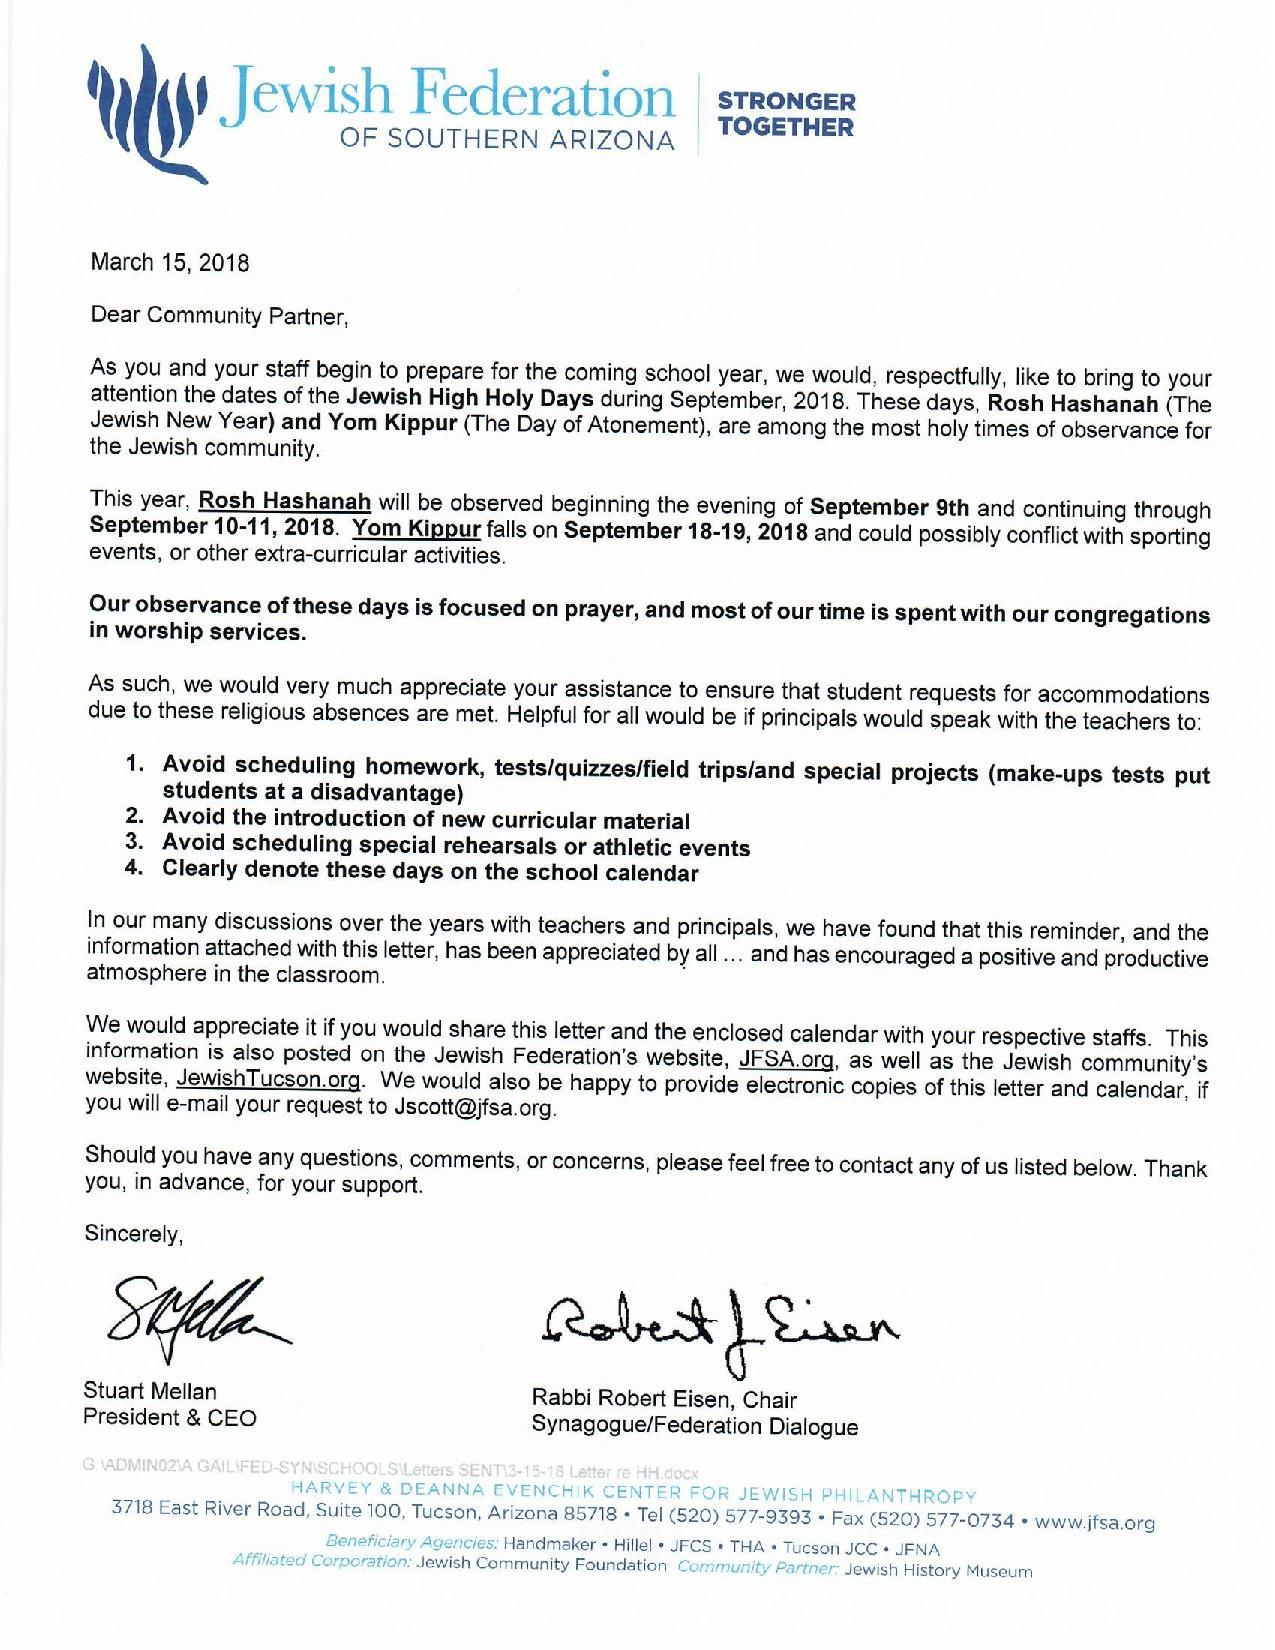 Five Year Calendar Jewish Federation Of Southern Arizona